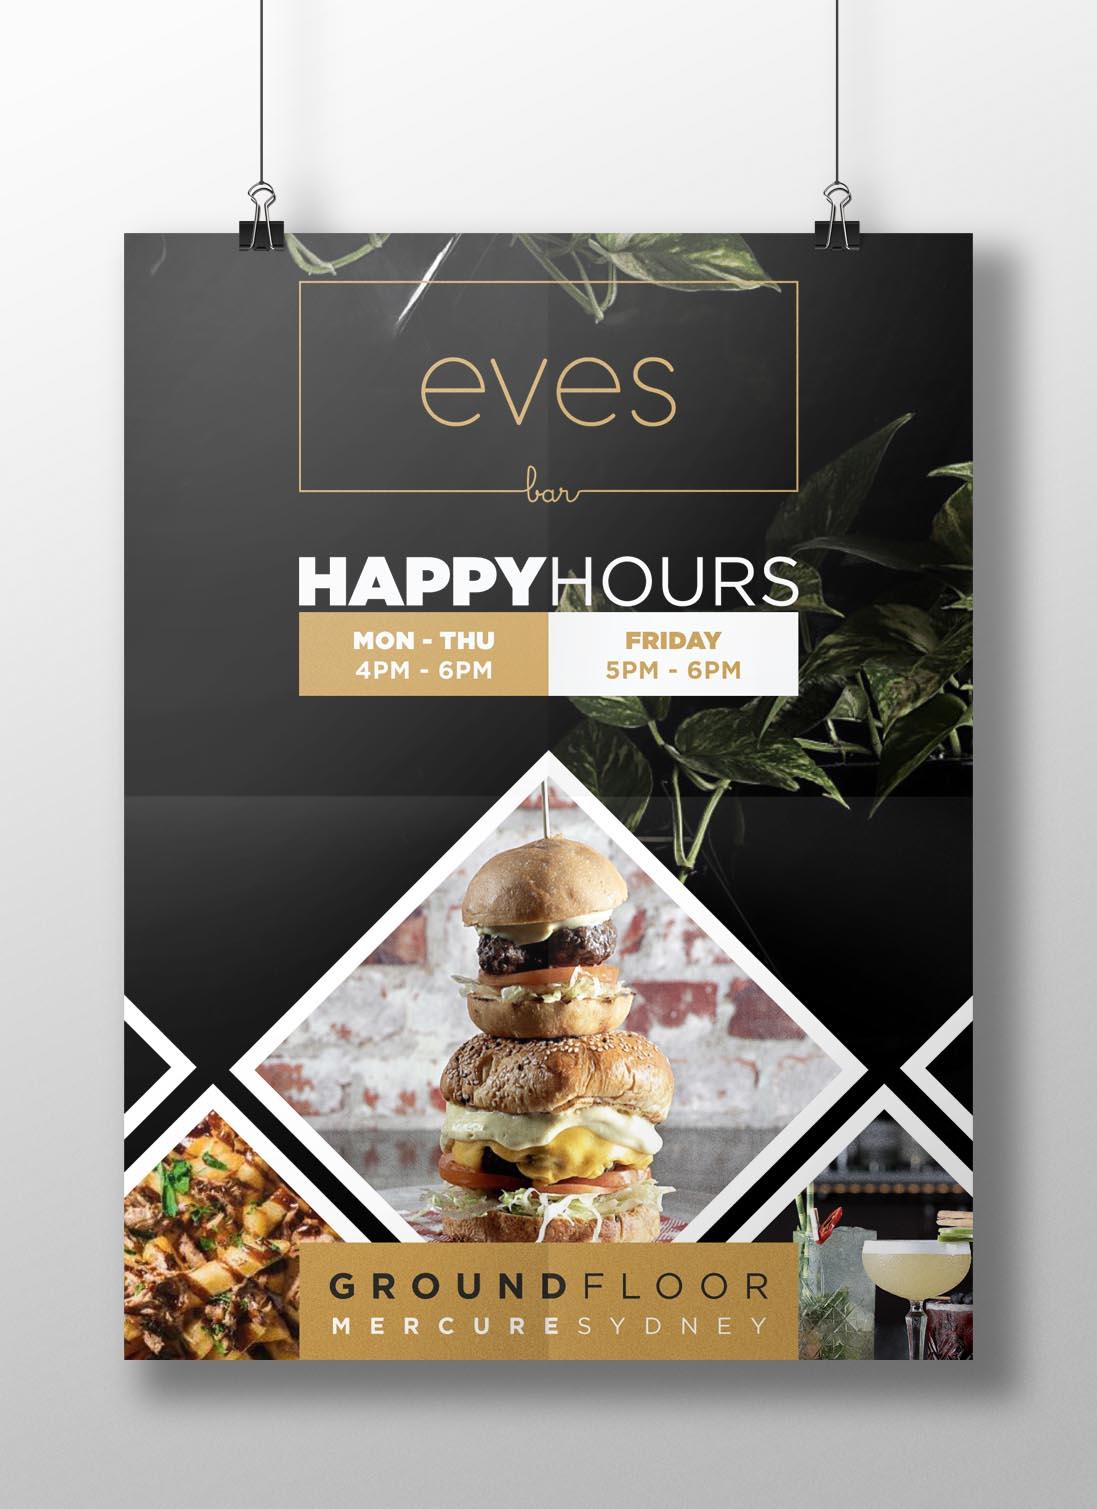 Eve's Bar Happy Hour